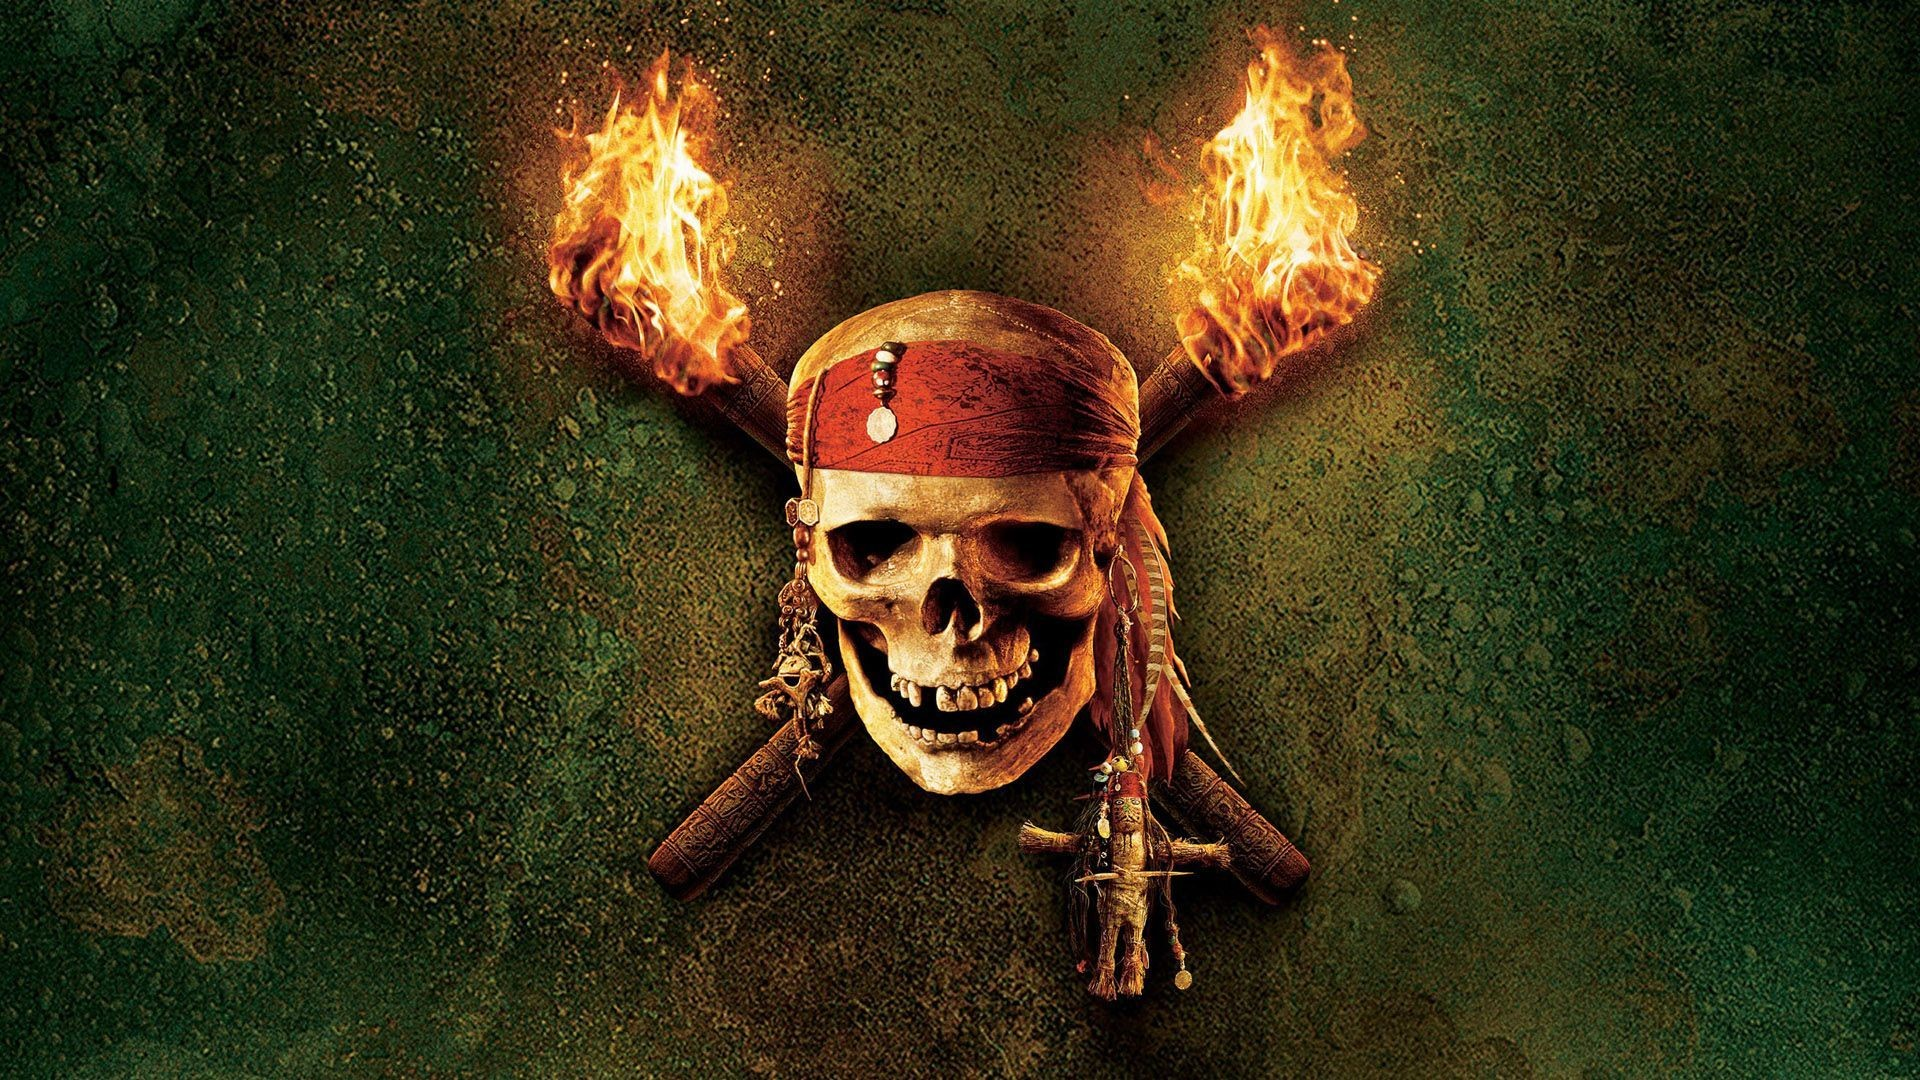 File: Pirates Of The Caribbean Wallpapers HD Quality.jpg | Luba Kliebert |  1920×1080